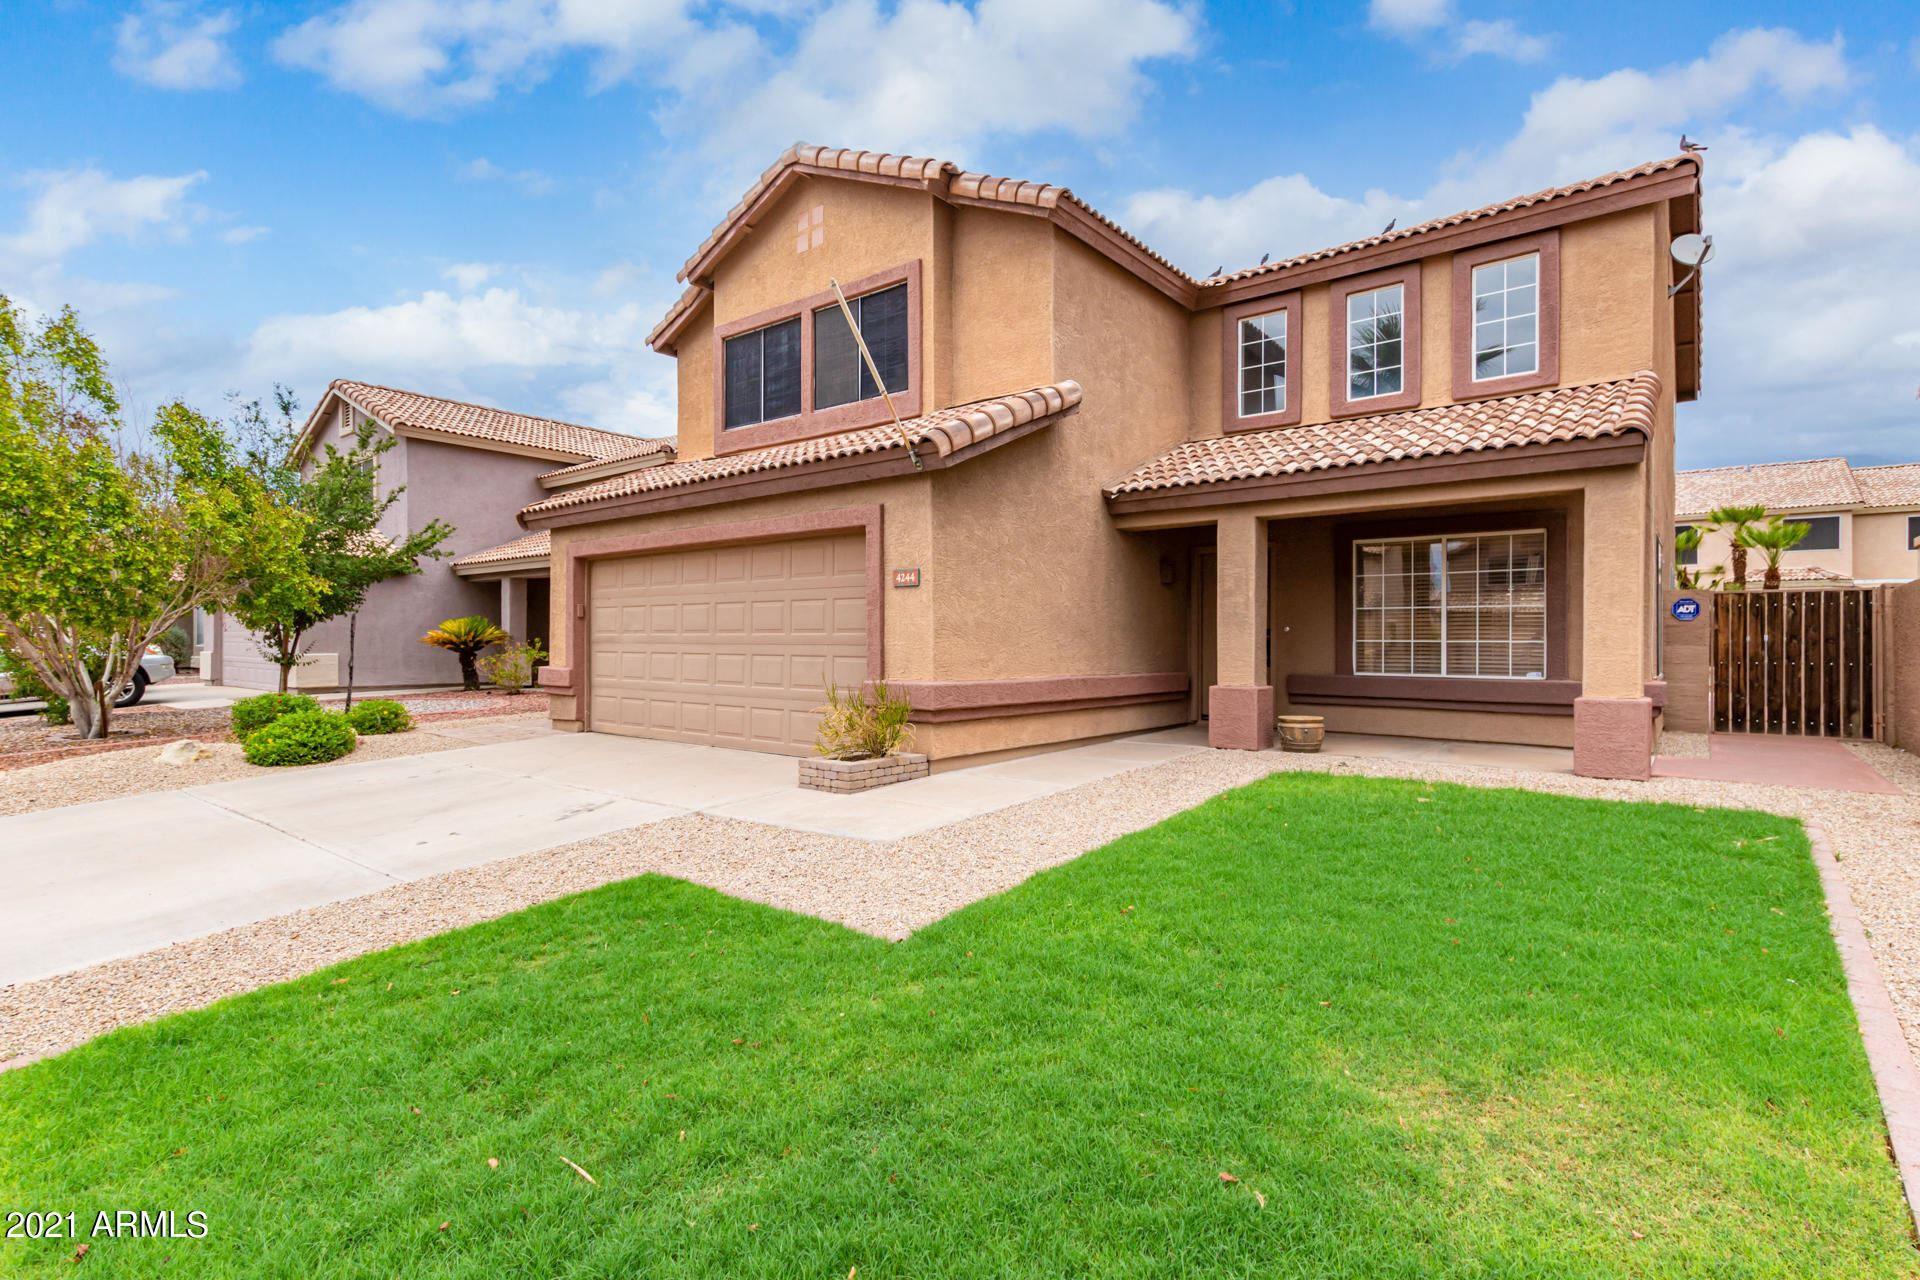 4244 E Raven Road, Phoenix, AZ 85044 - MLS#: 6257366